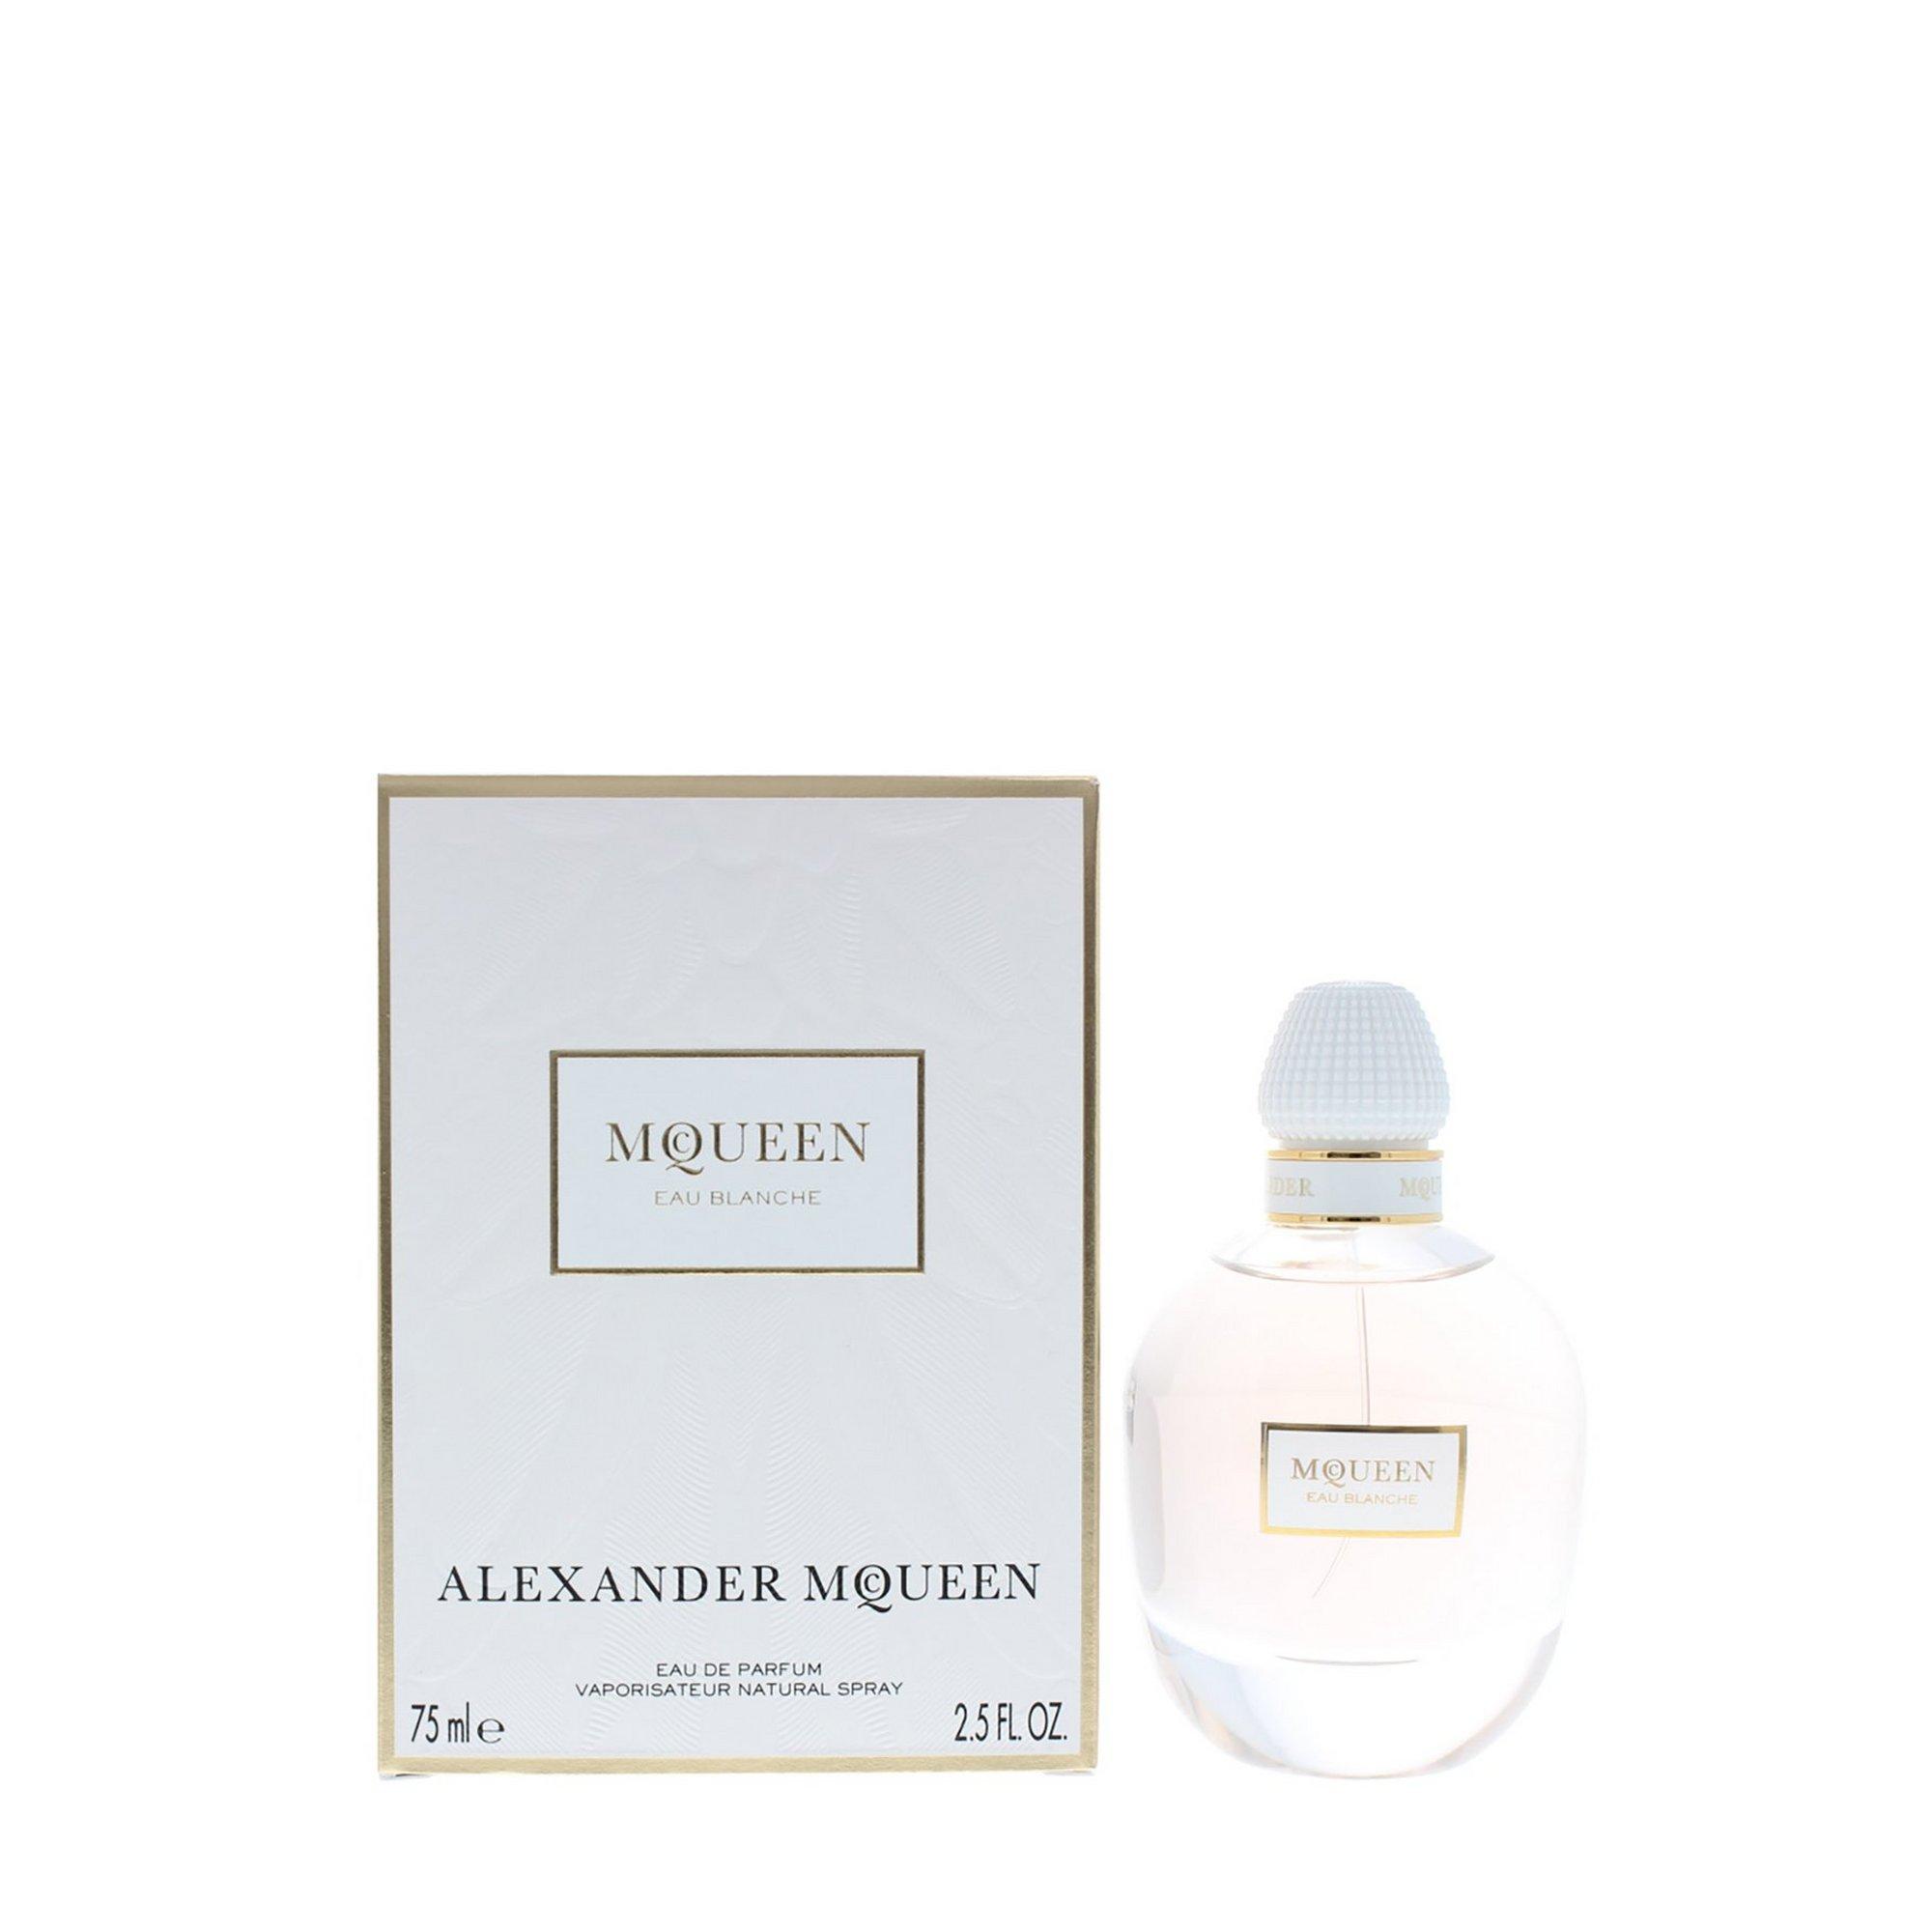 Image of Alexander McQueen Eau Blanche 75ml EDP